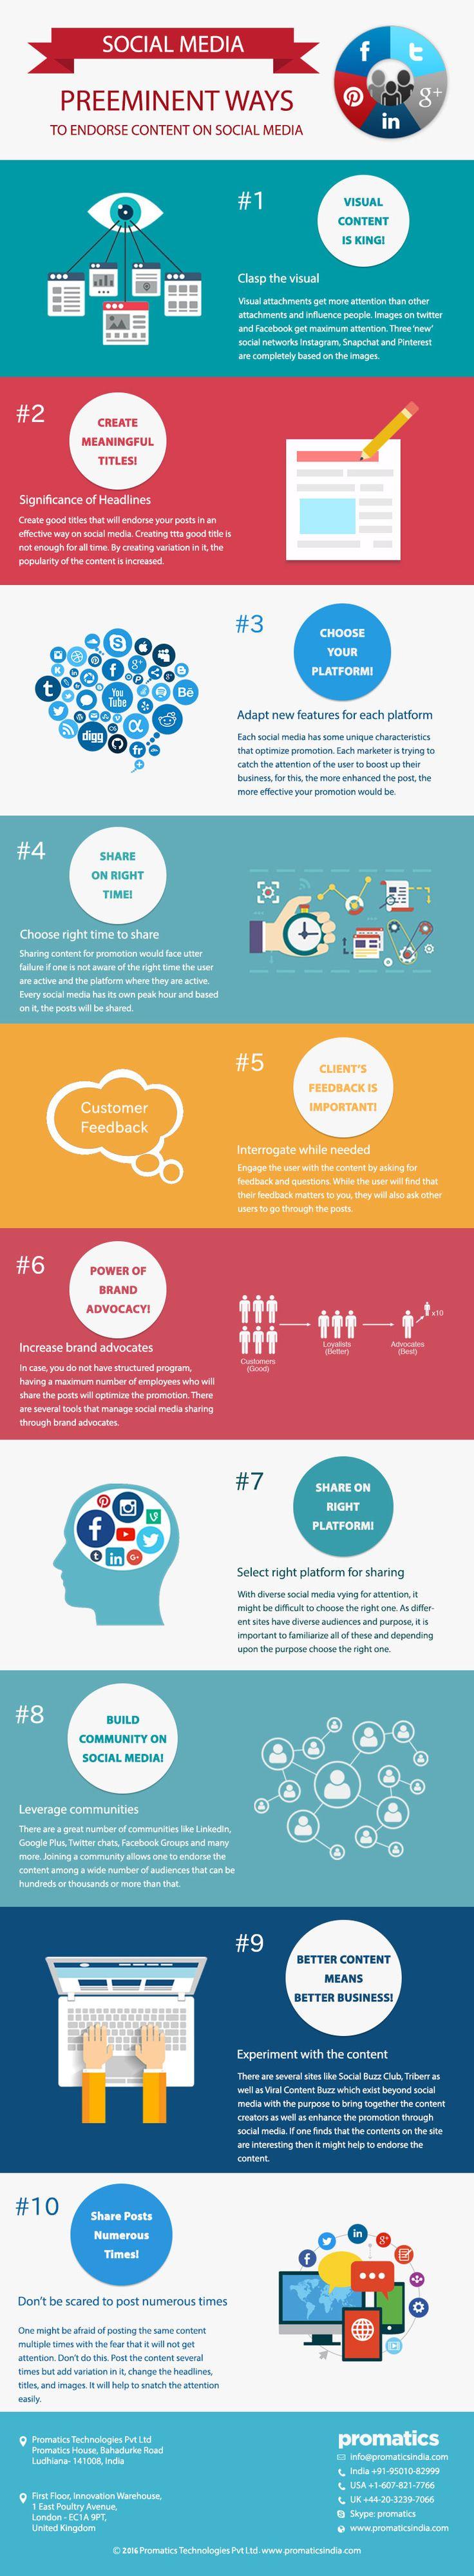 Preeminent ways to endorse #content on #social media http://www.promaticsindia.com/blog/preeminent-ways-to-endorse-content-on-social-media/ #smm #contentmarketing #socialmediamanagement